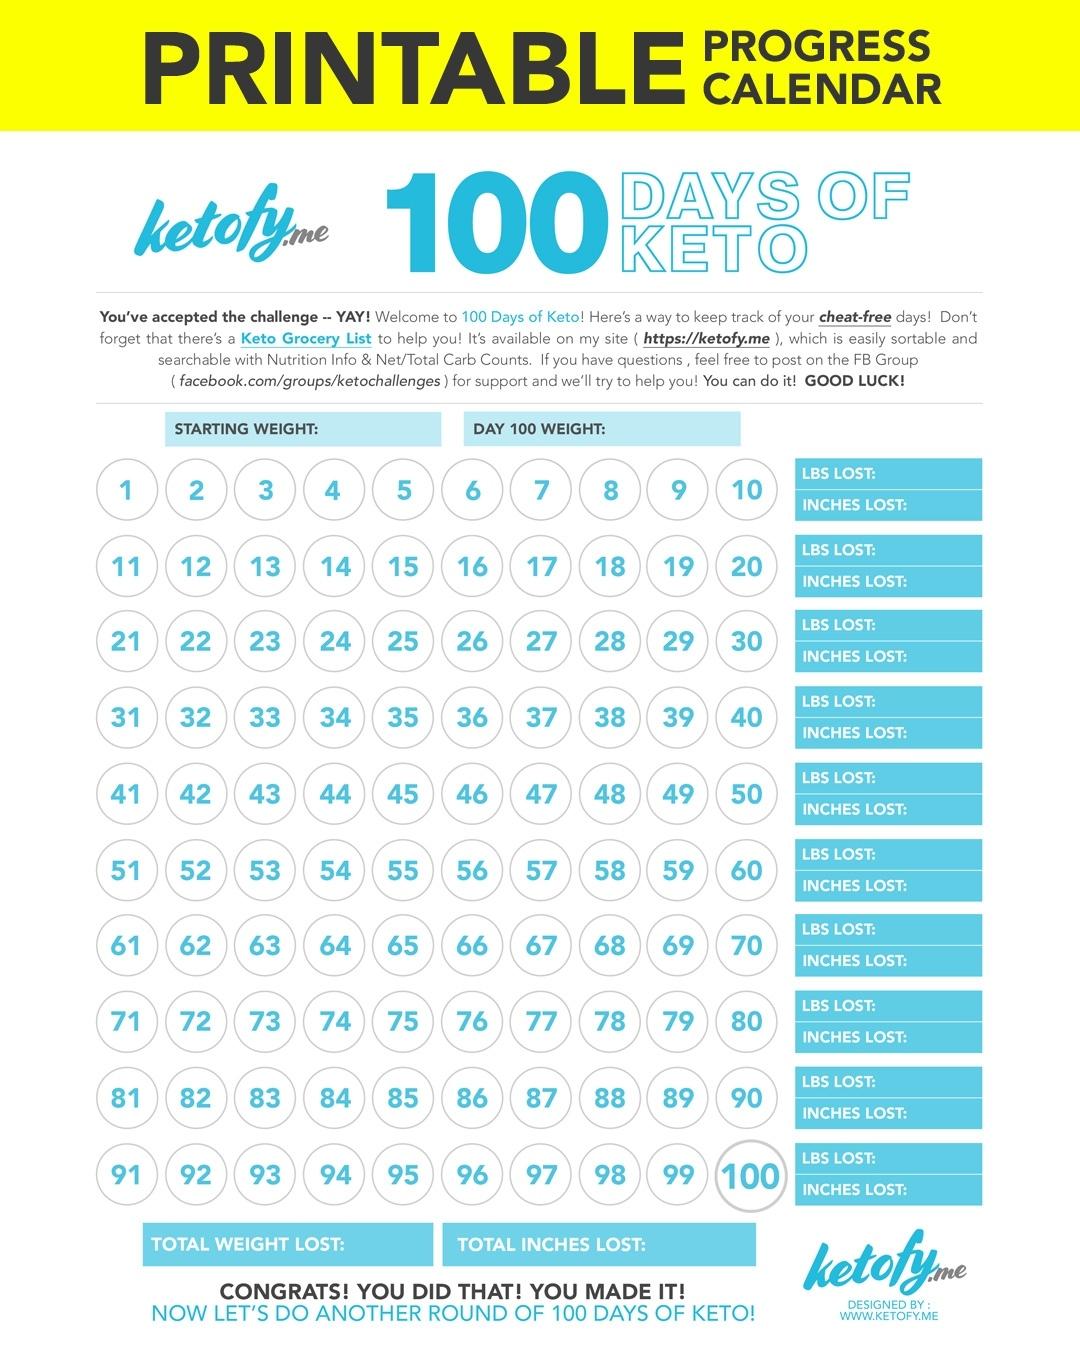 Keto ~ Fy Me | Cut Carbs, Not Flavor! • 100 Days Of Keto 100 Day Countdown Calendar Printable